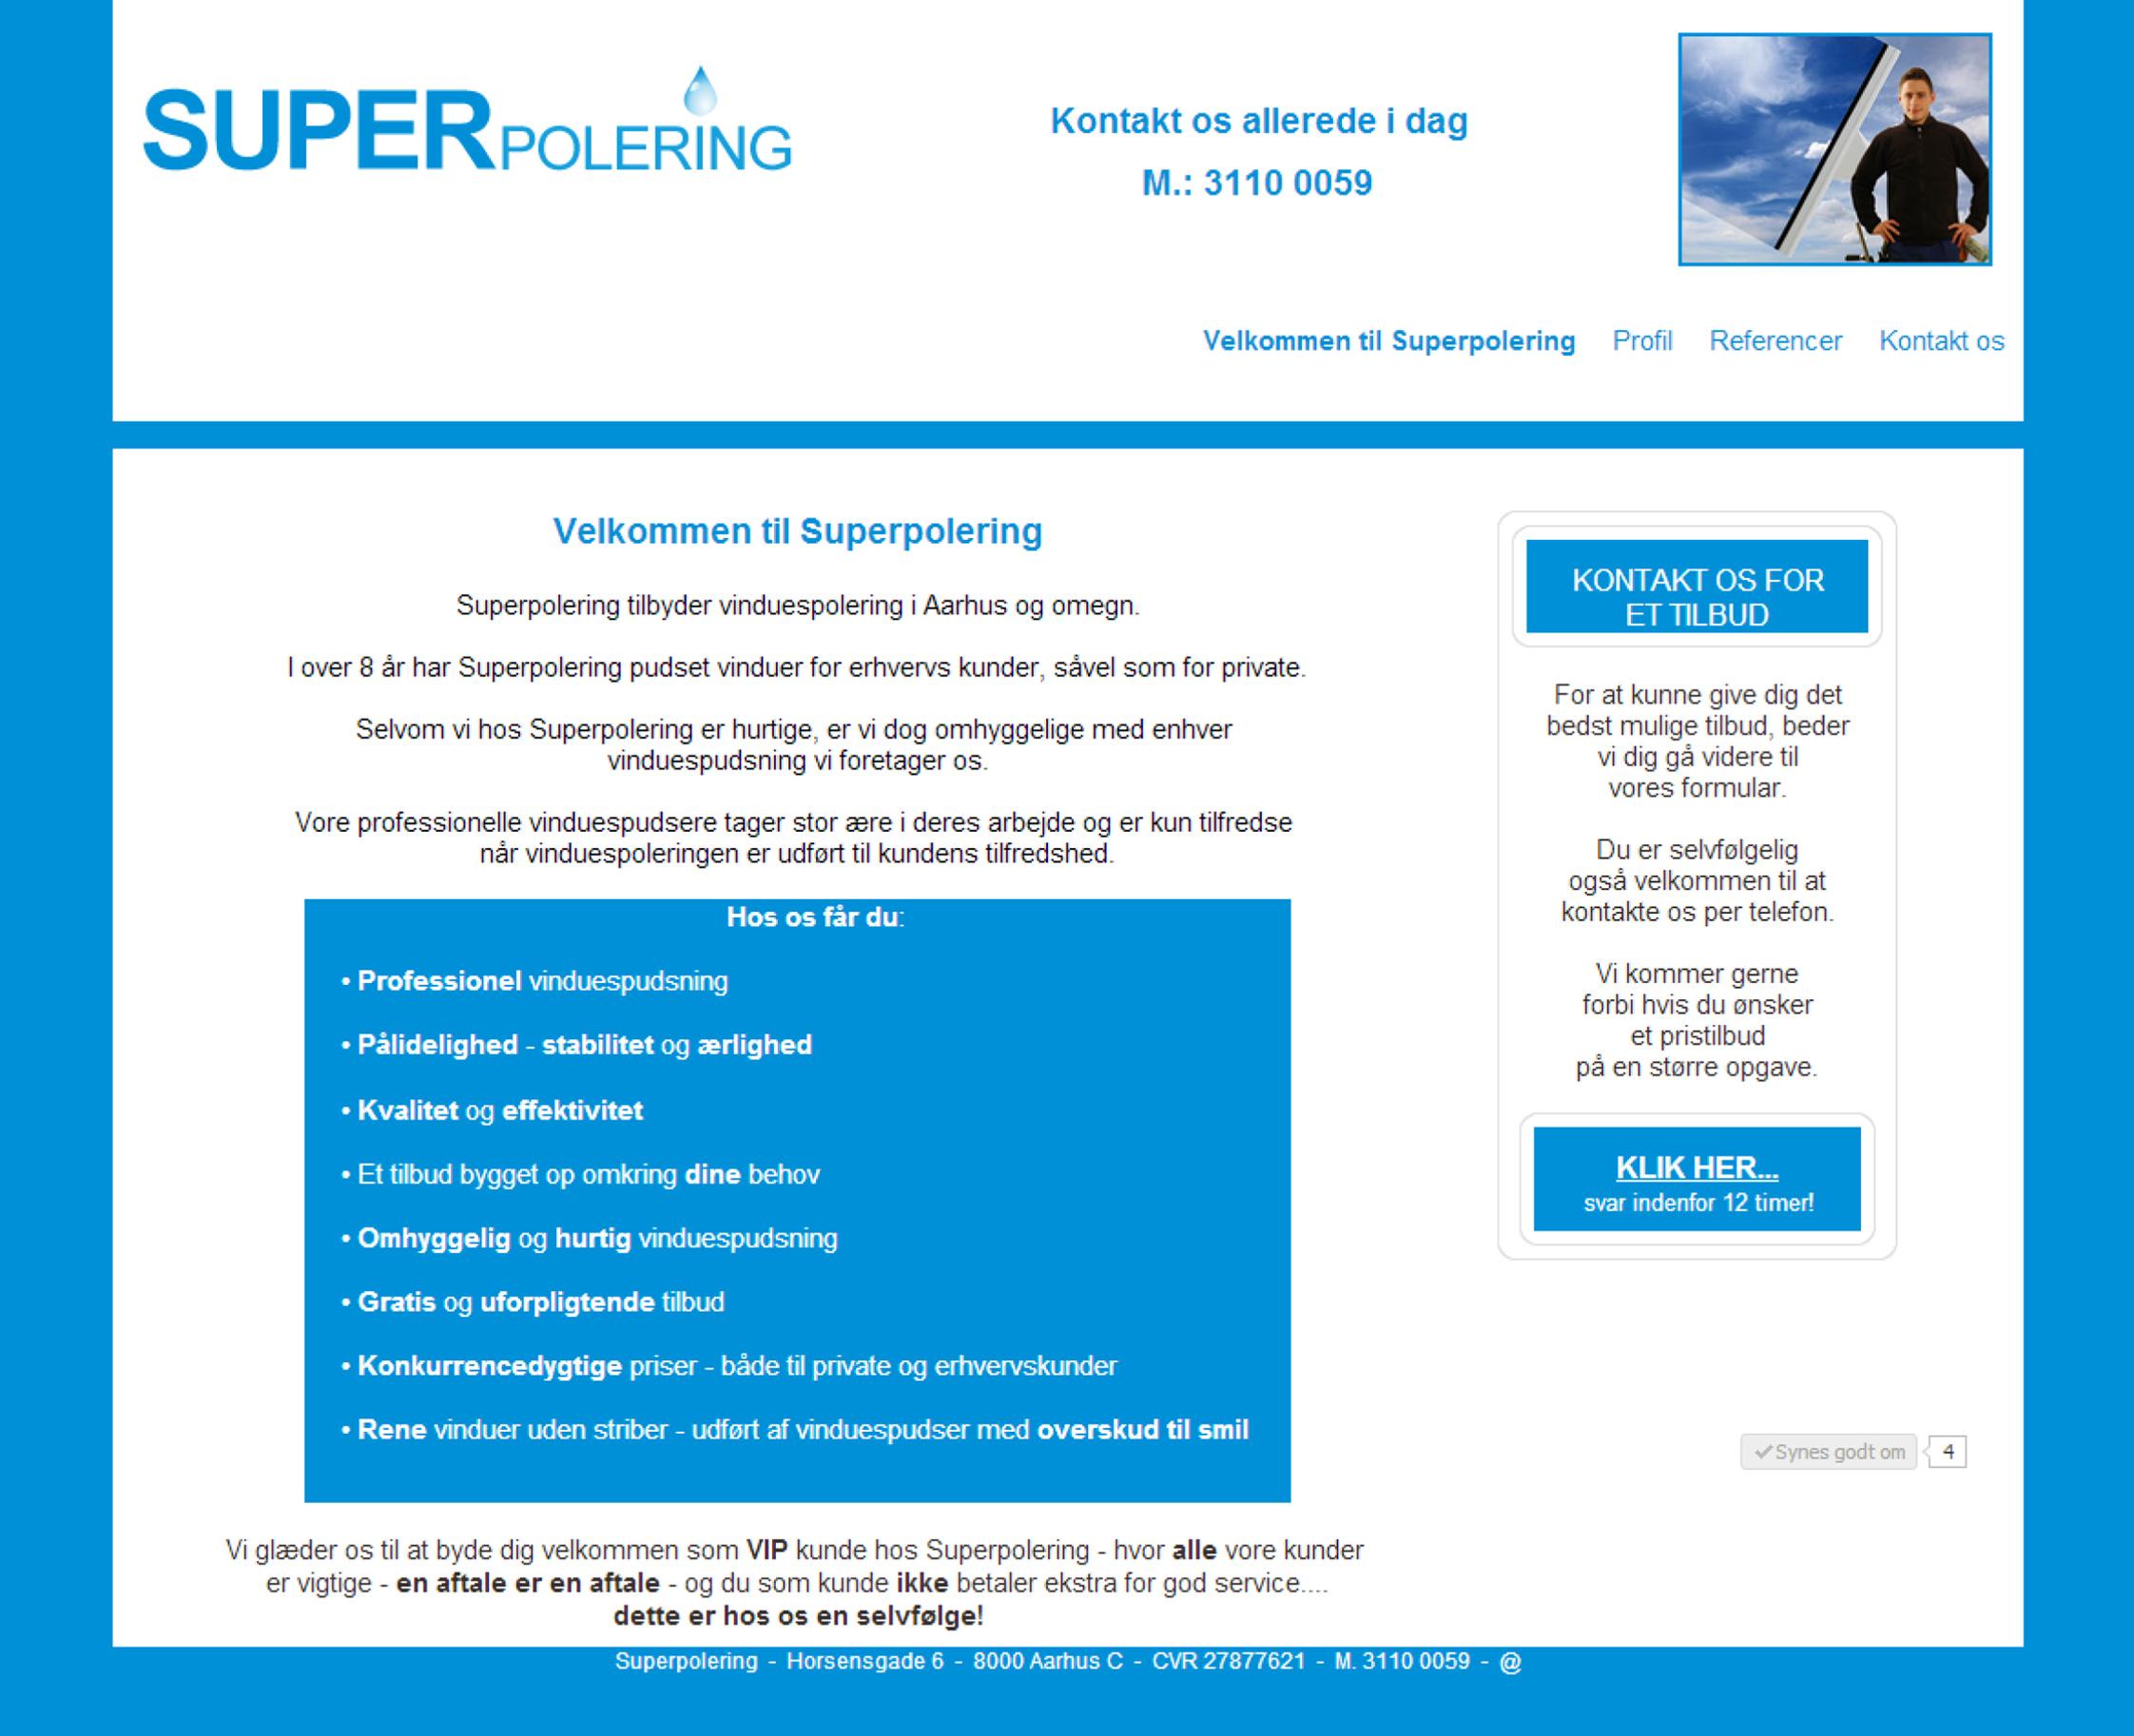 Superpolering